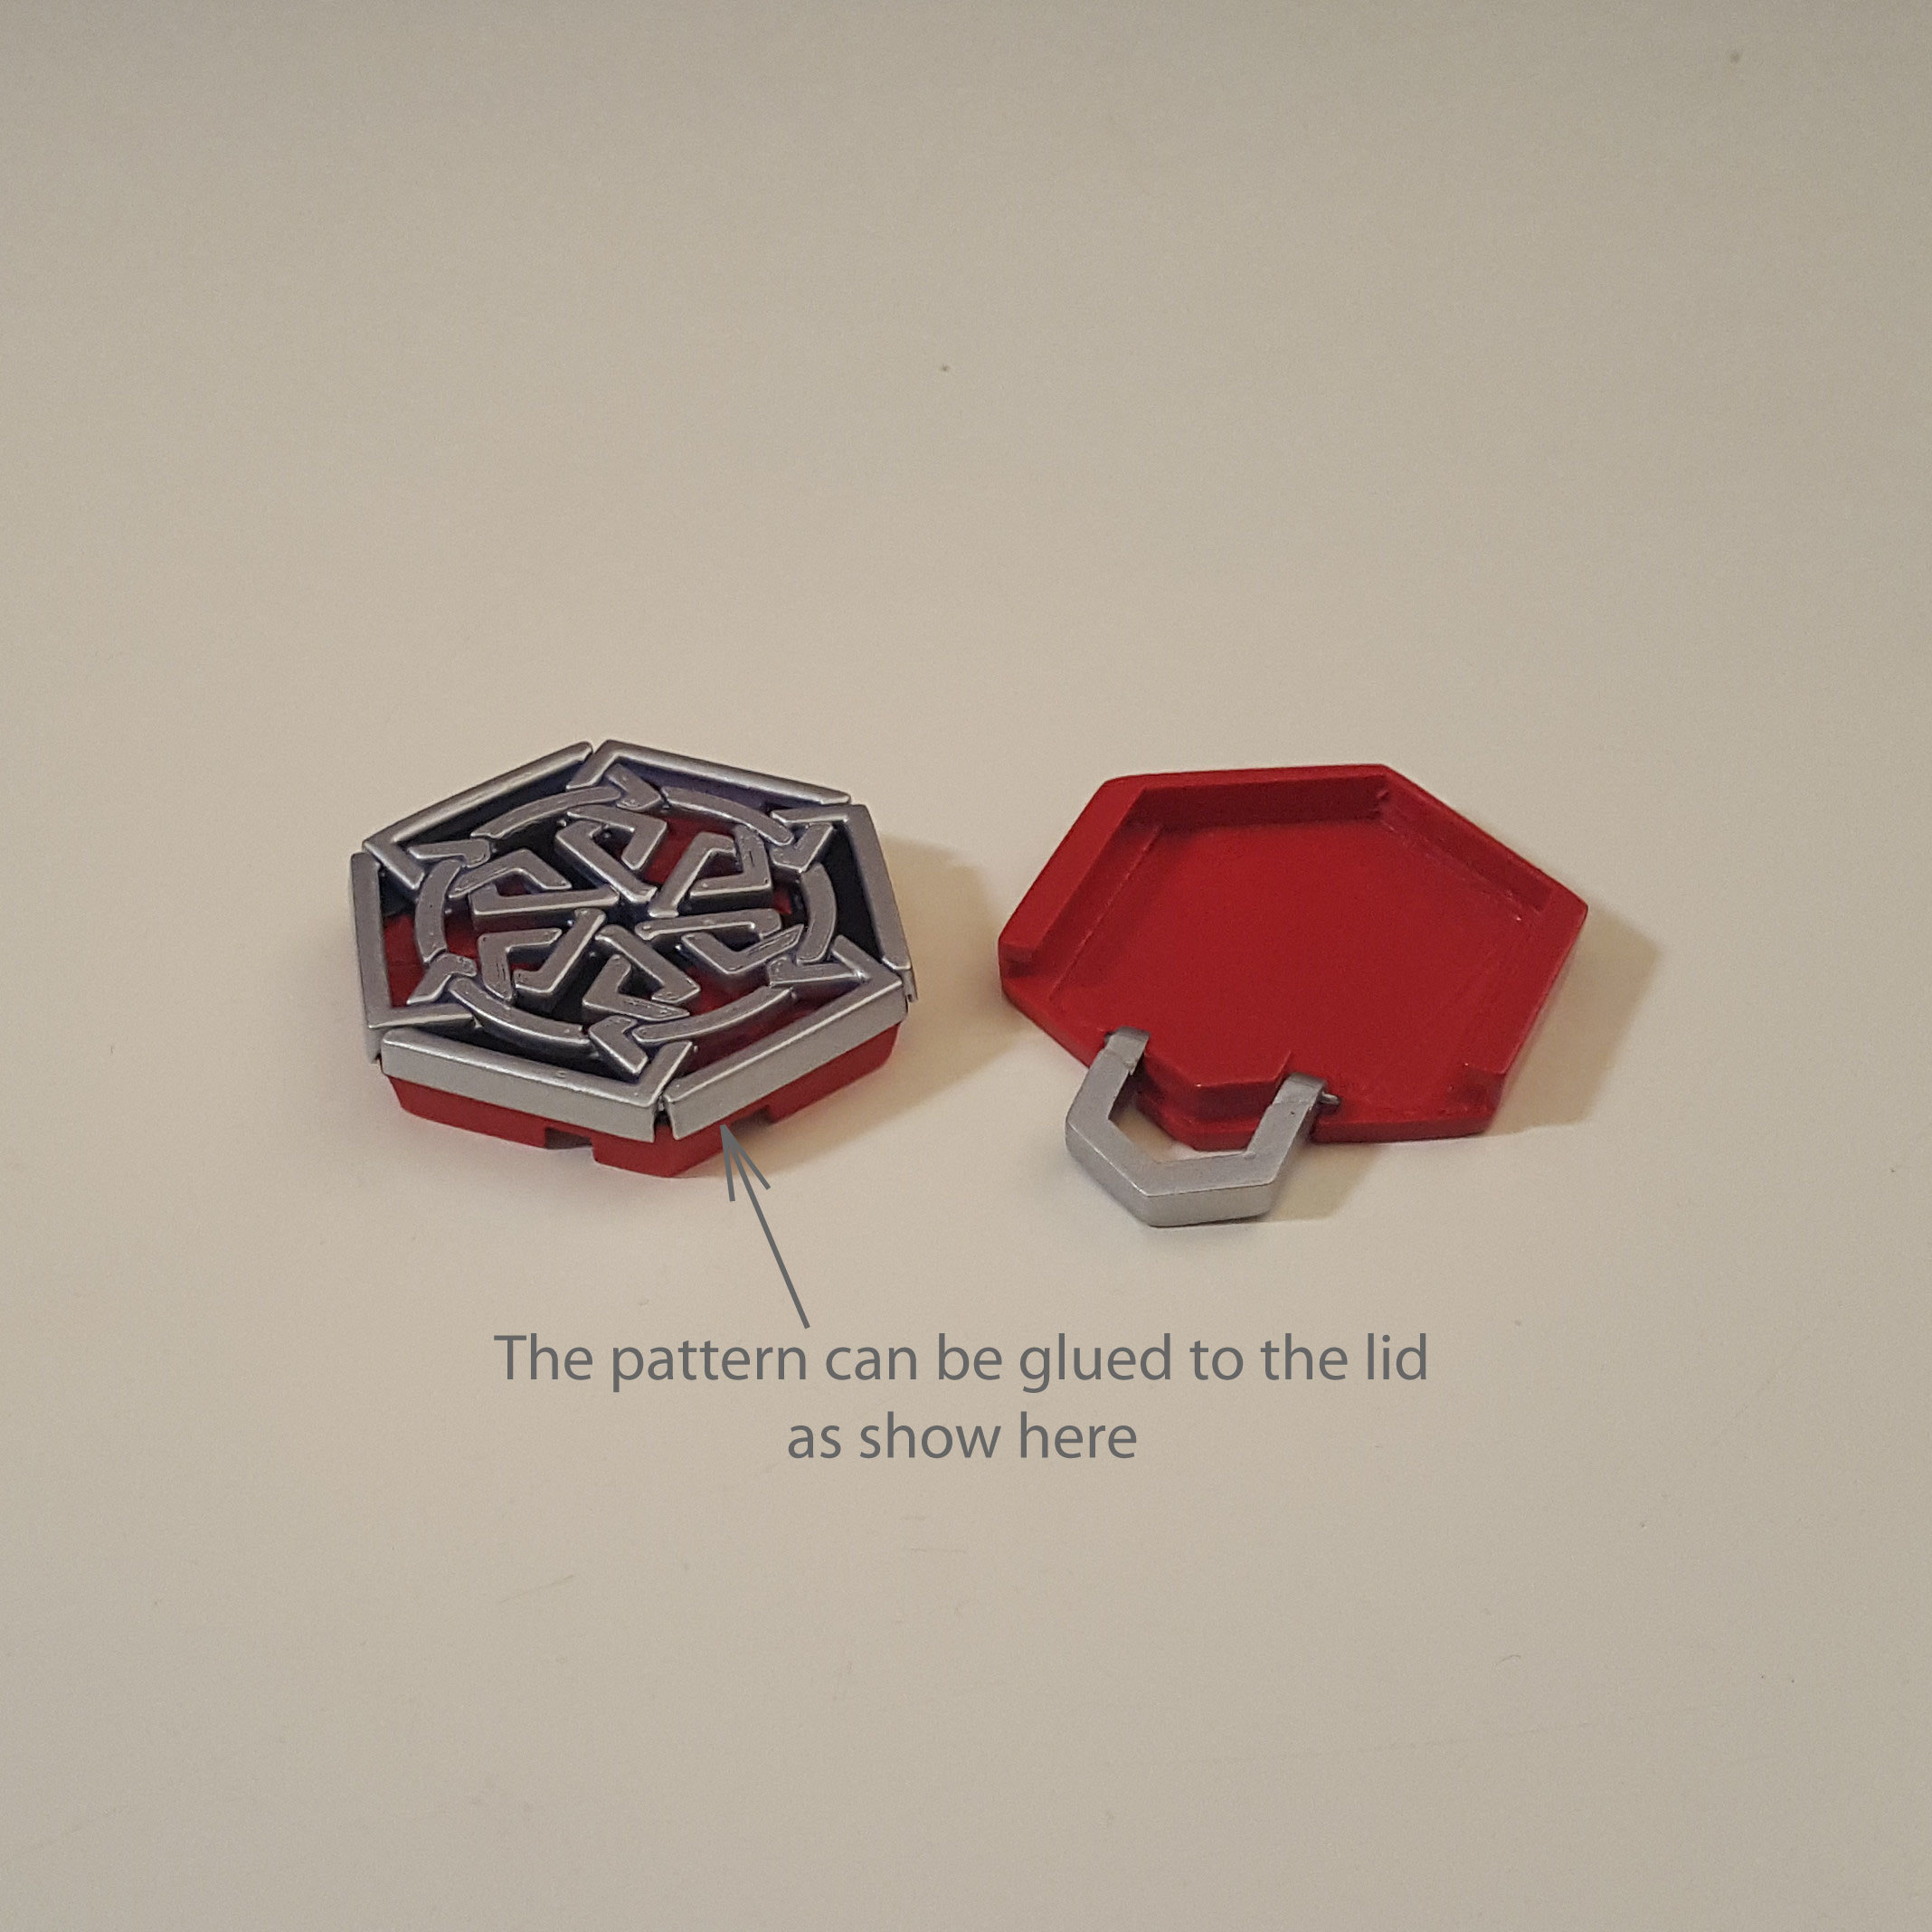 medallion parts and assembly4.jpg Download free STL file Secret geometry medallion • 3D printable model, Job